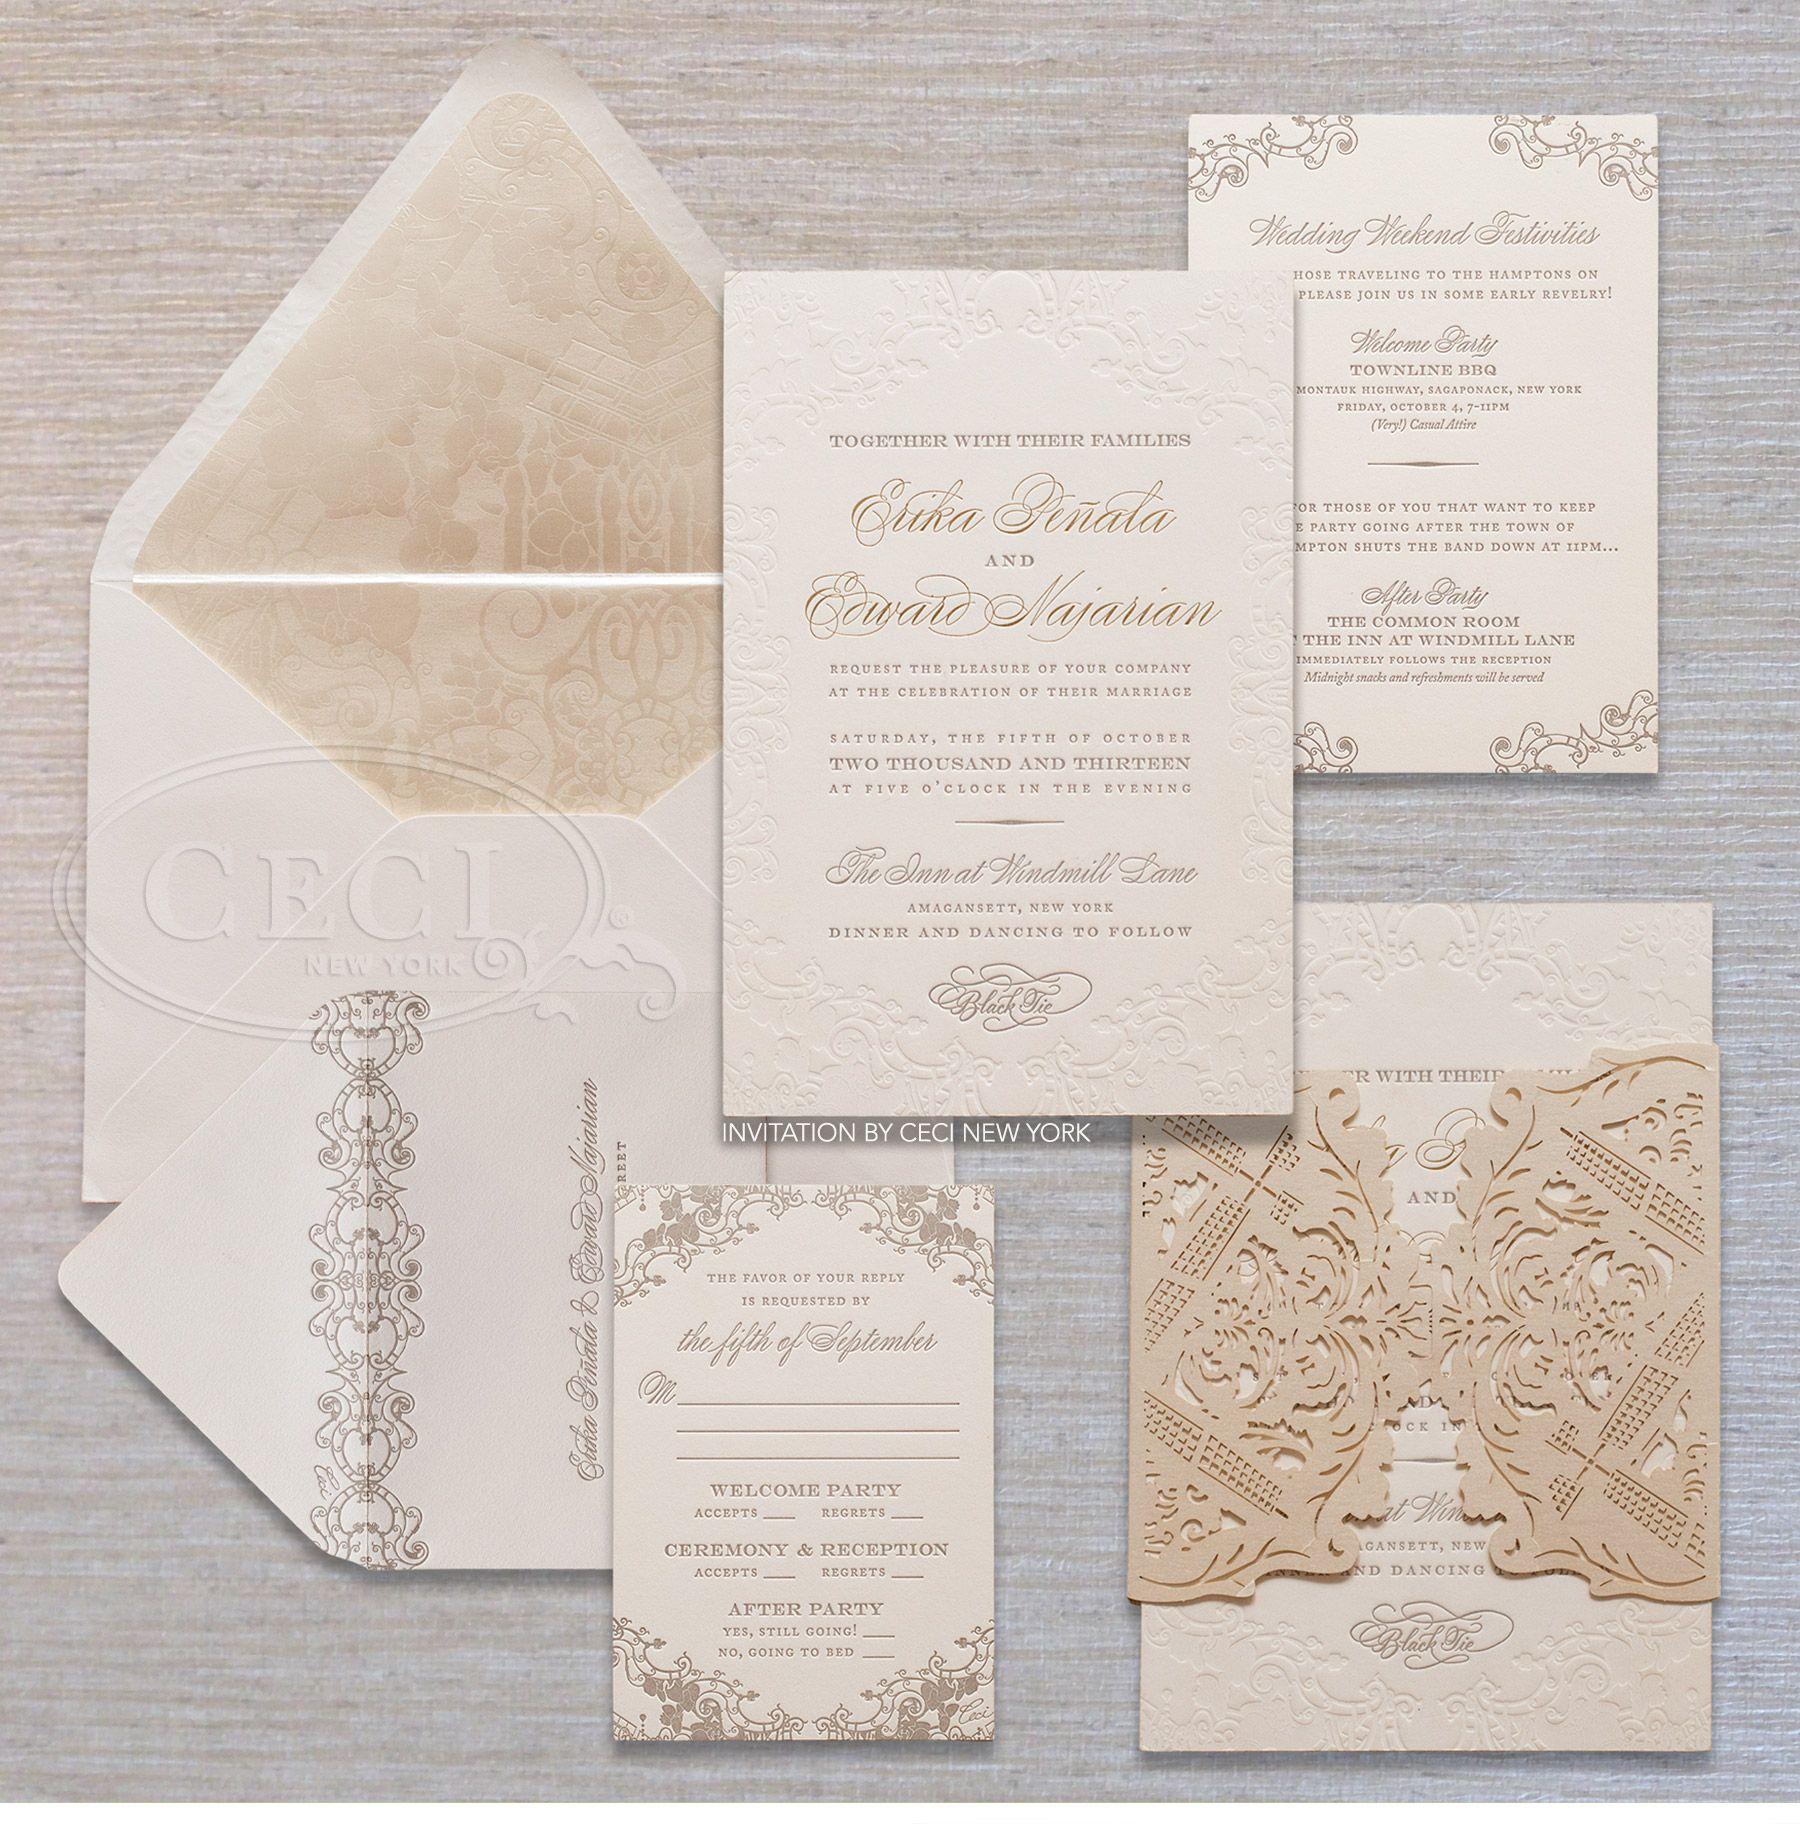 Luxury wedding invitations by ceci new york our muse ethereal luxury wedding invitations by ceci new york our muse ethereal hamptons wedding be monicamarmolfo Gallery